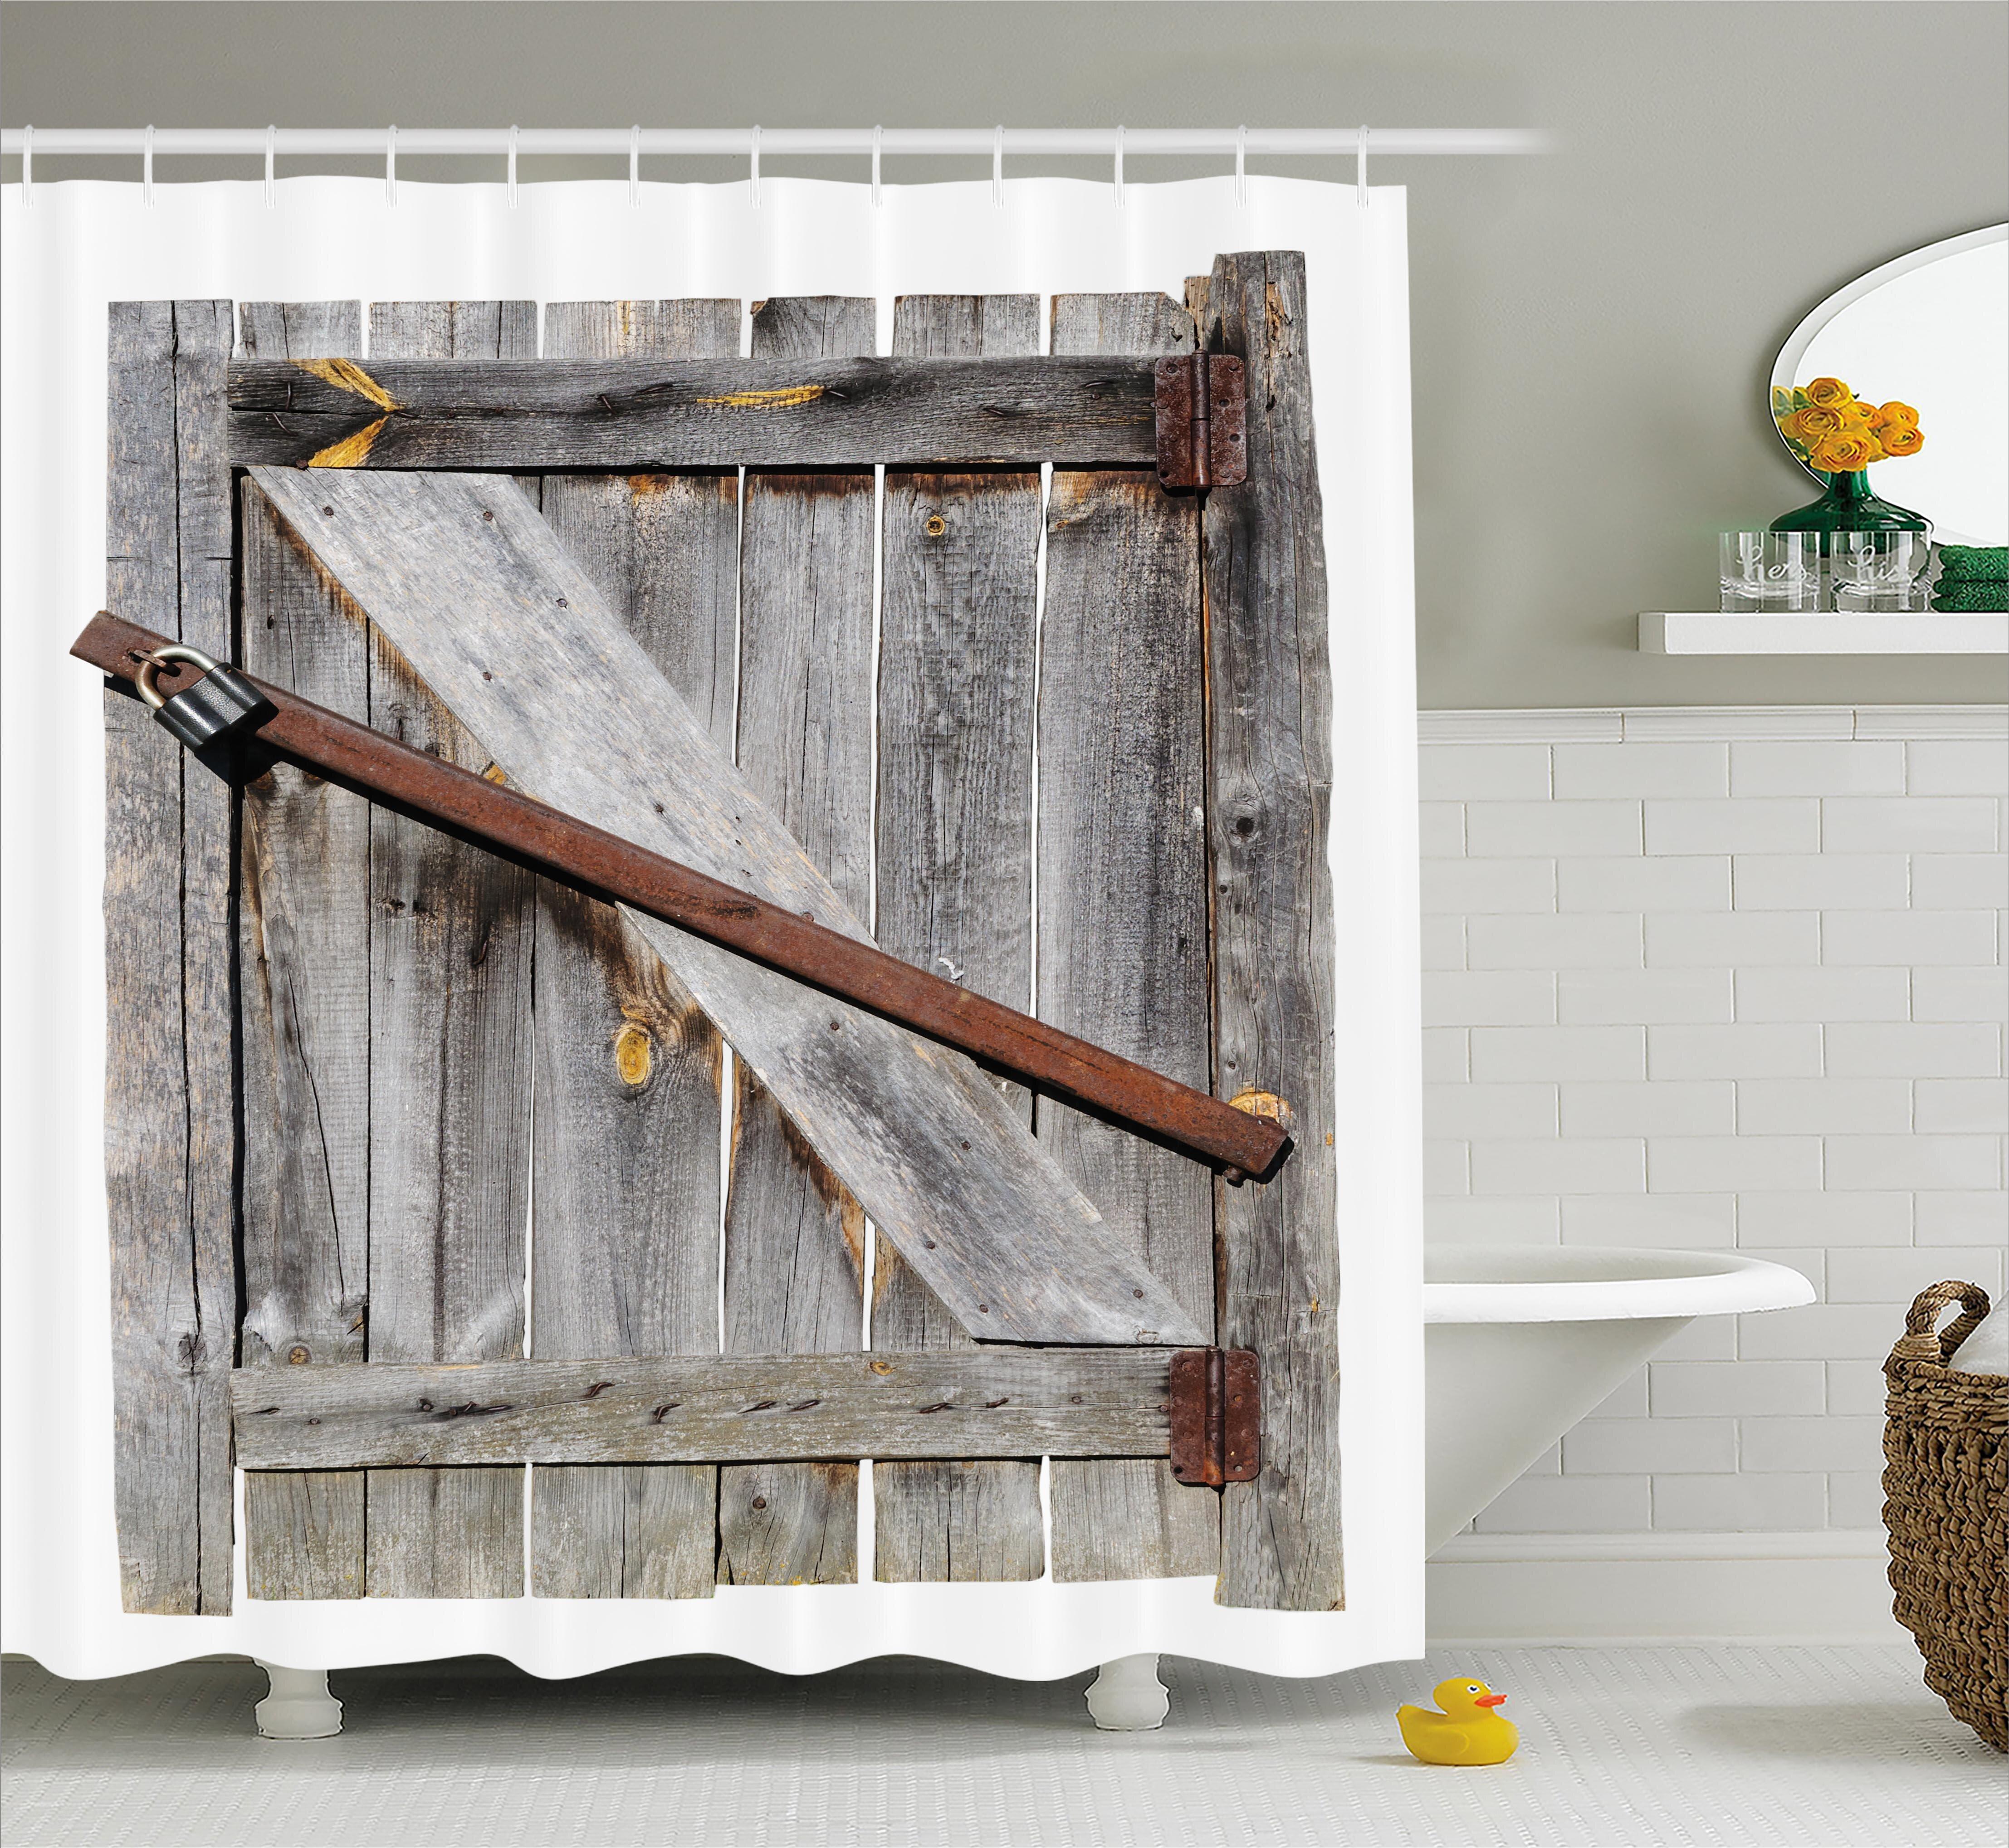 East Urban Home Rustic Aged Wooden Barn Door Single Shower Curtain | Wayfair